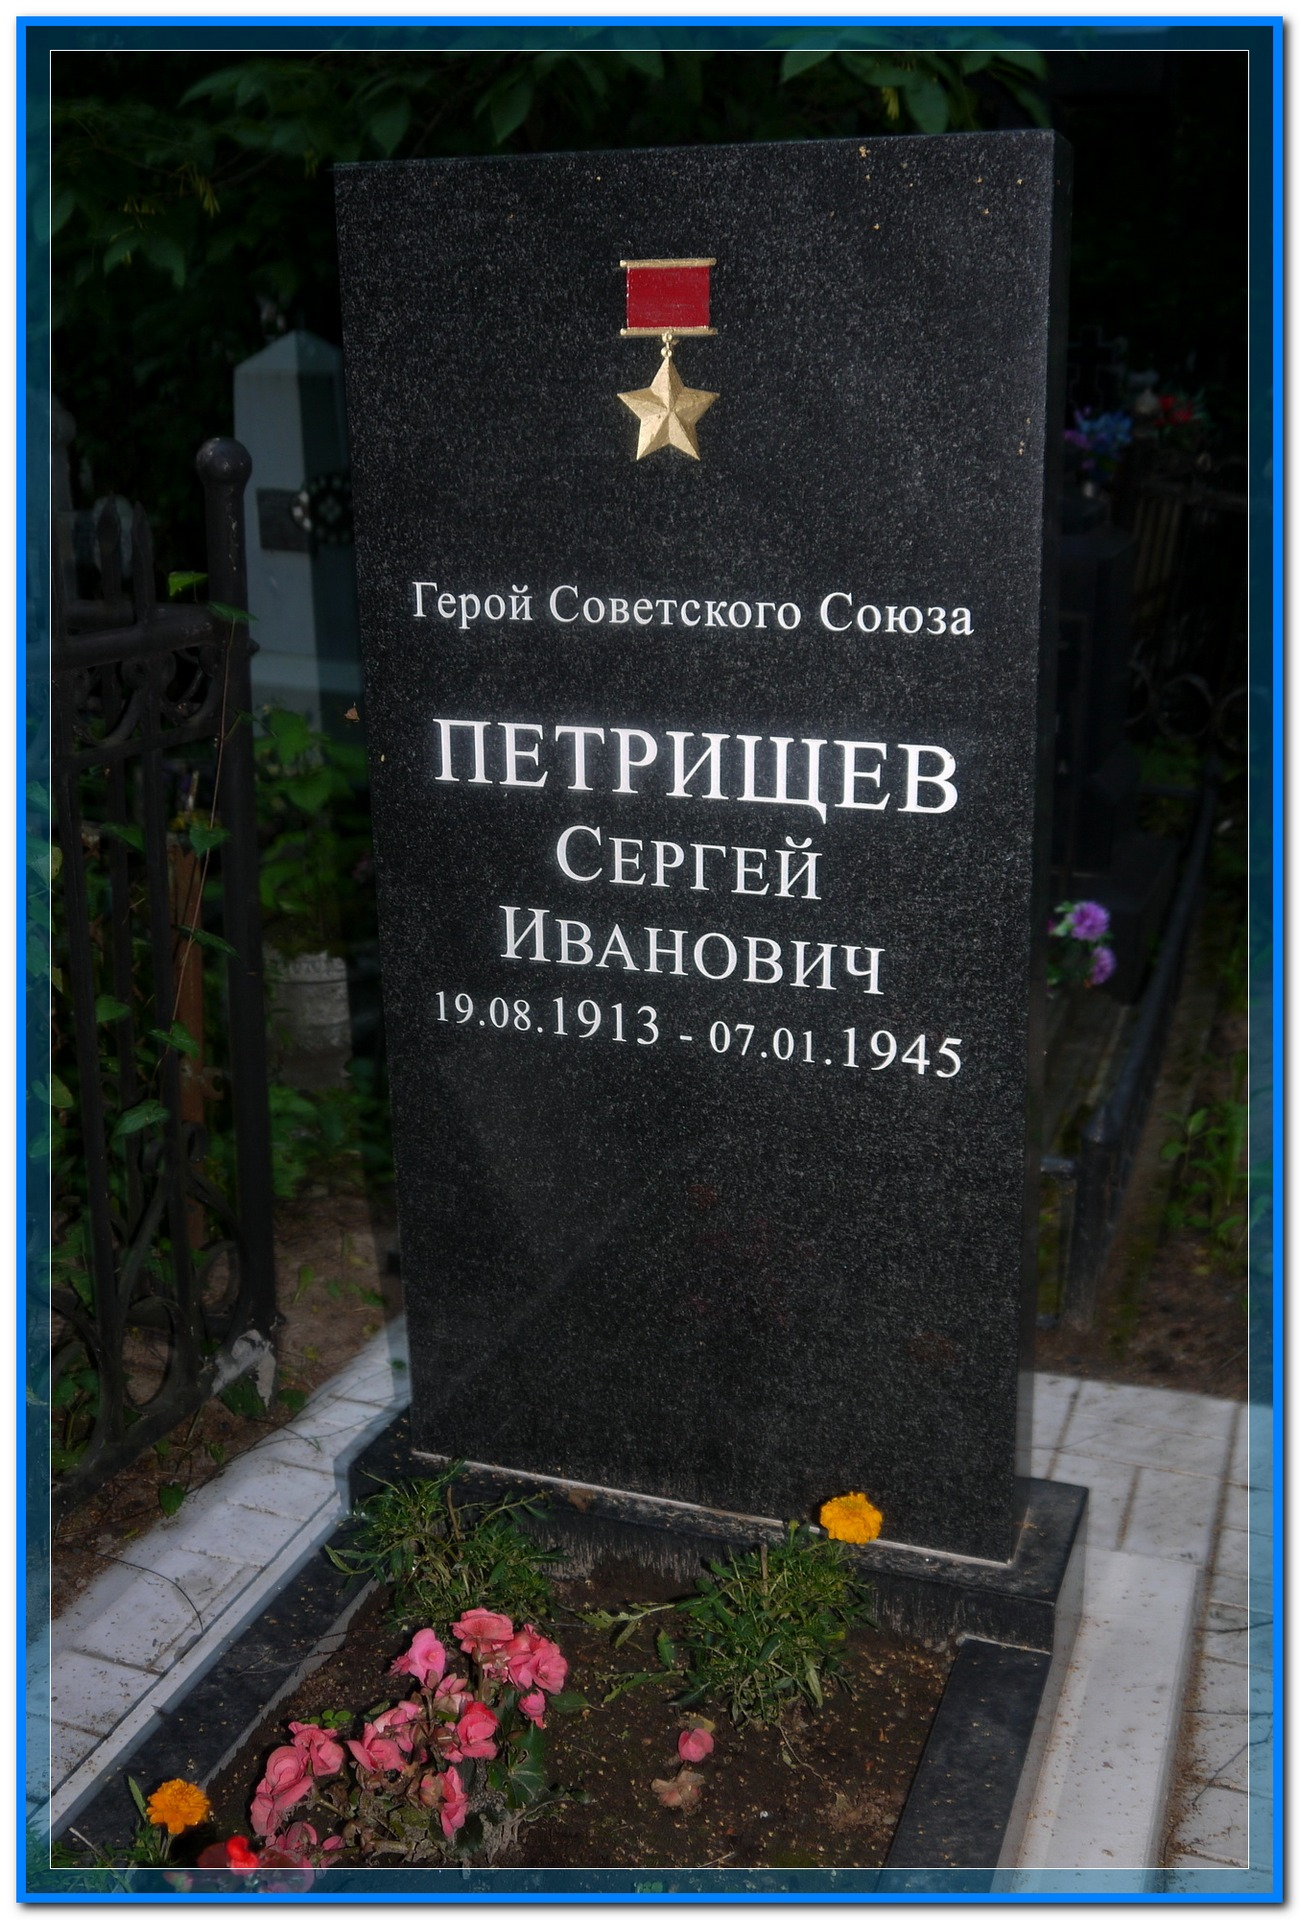 © Петрищев Сергей Иванович